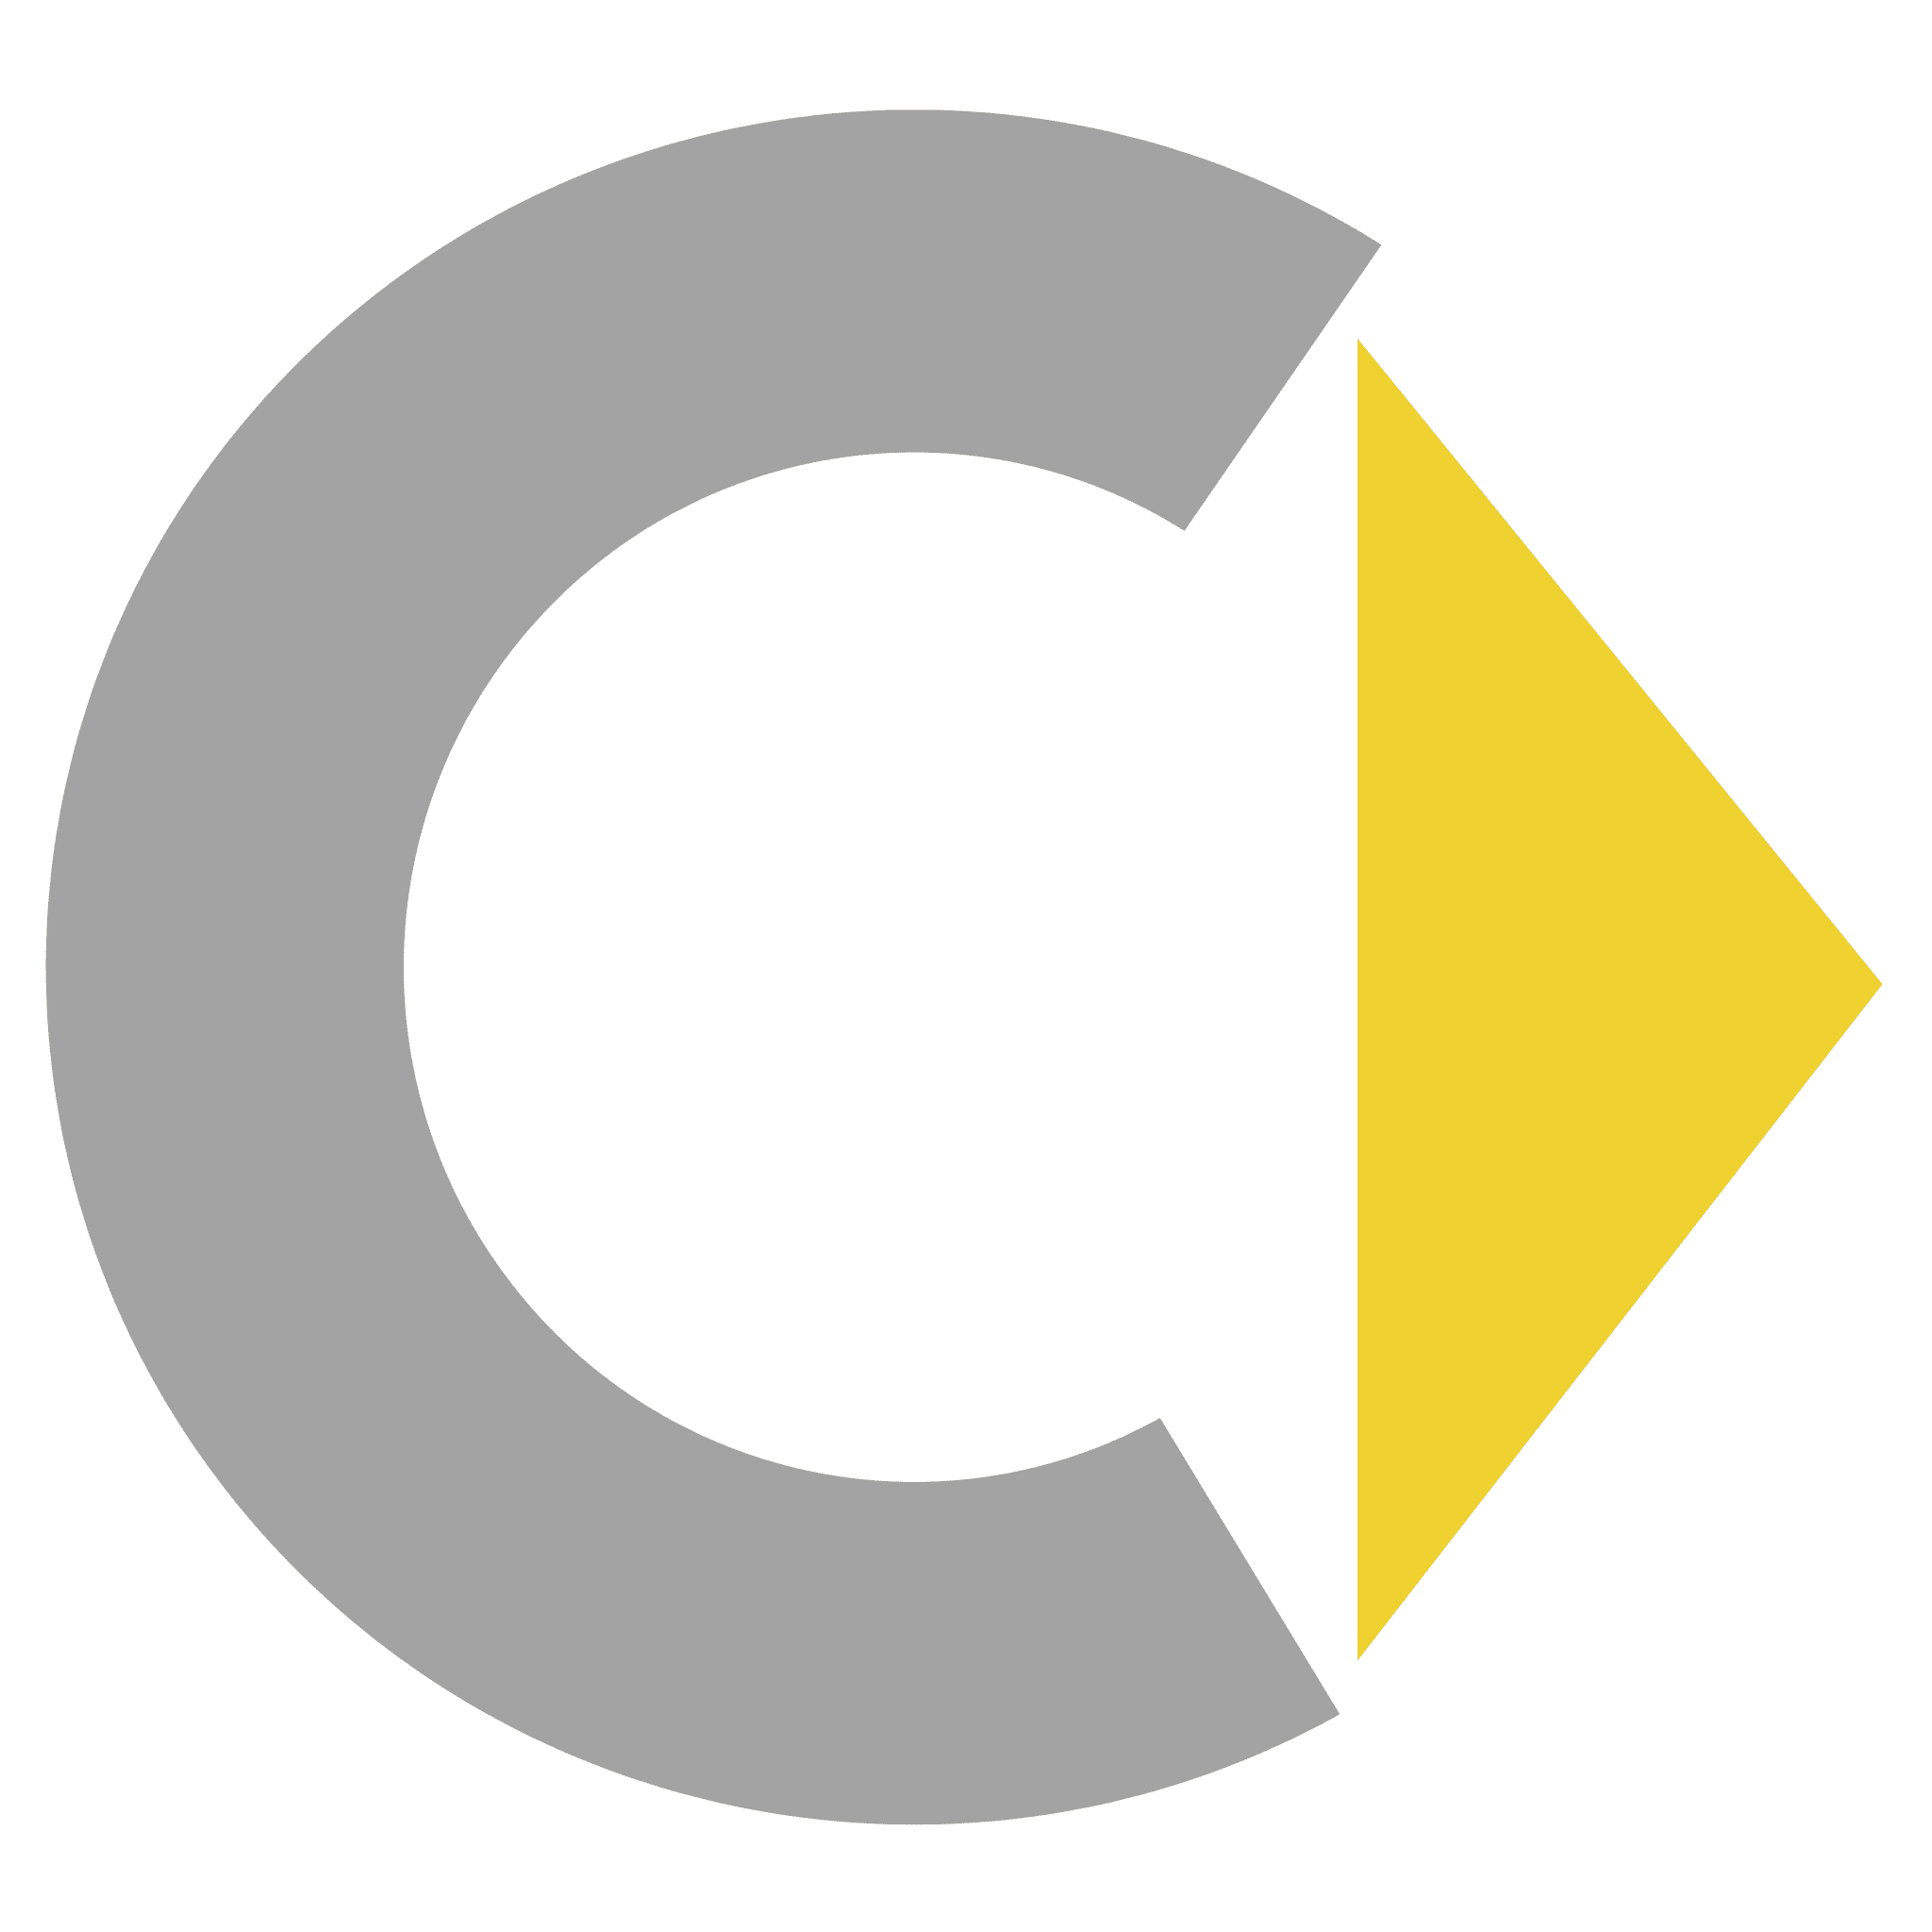 Smart-symbol-1994-2048x2048